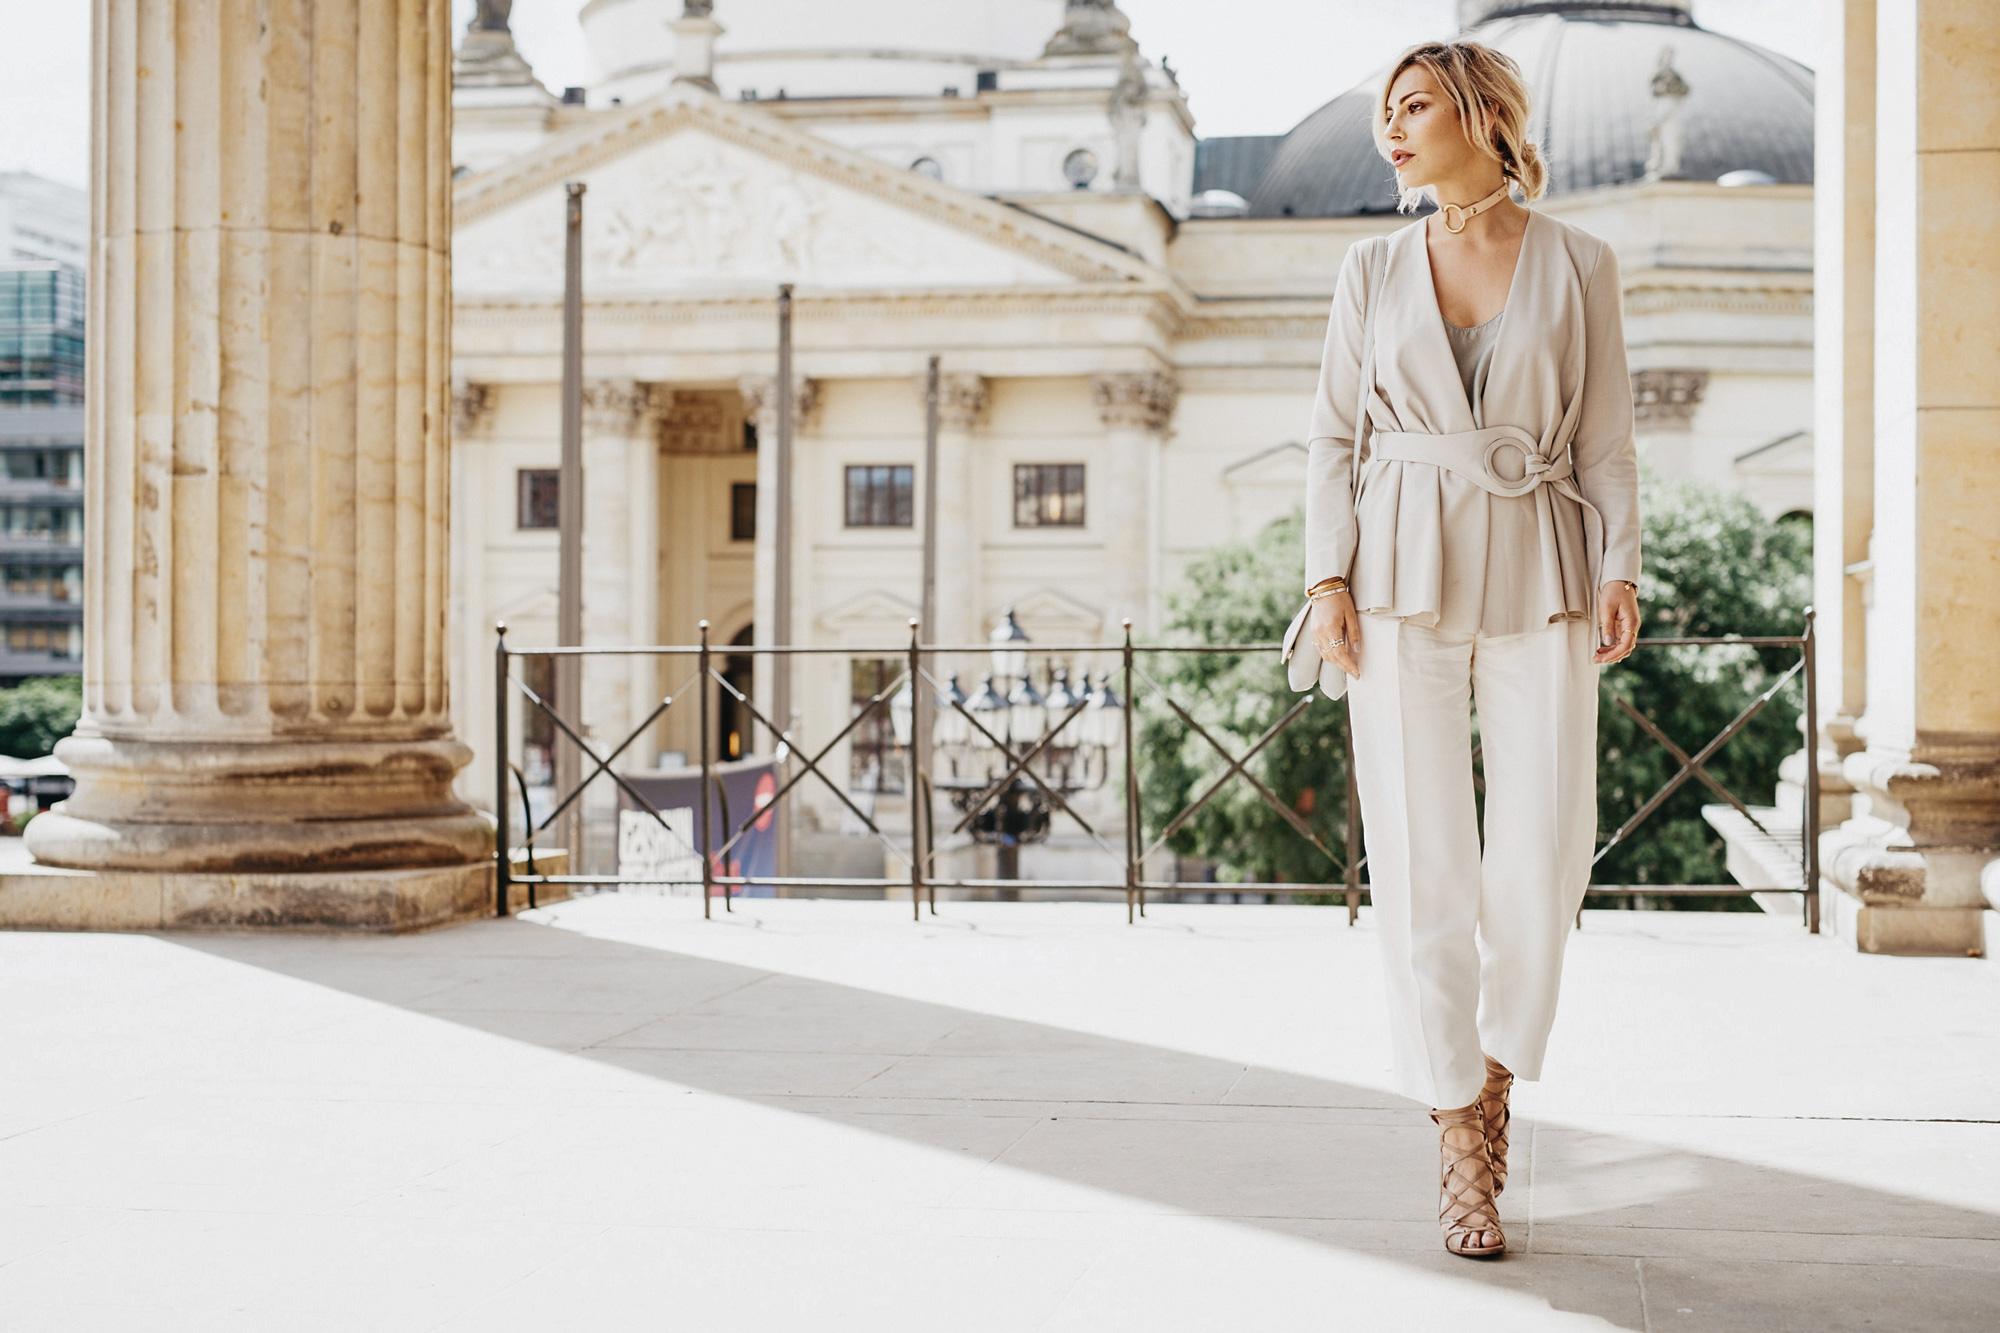 https://www.masha-sedgwick.com/wp-content/uploads/2016/07/pastel-outfit-4.jpg